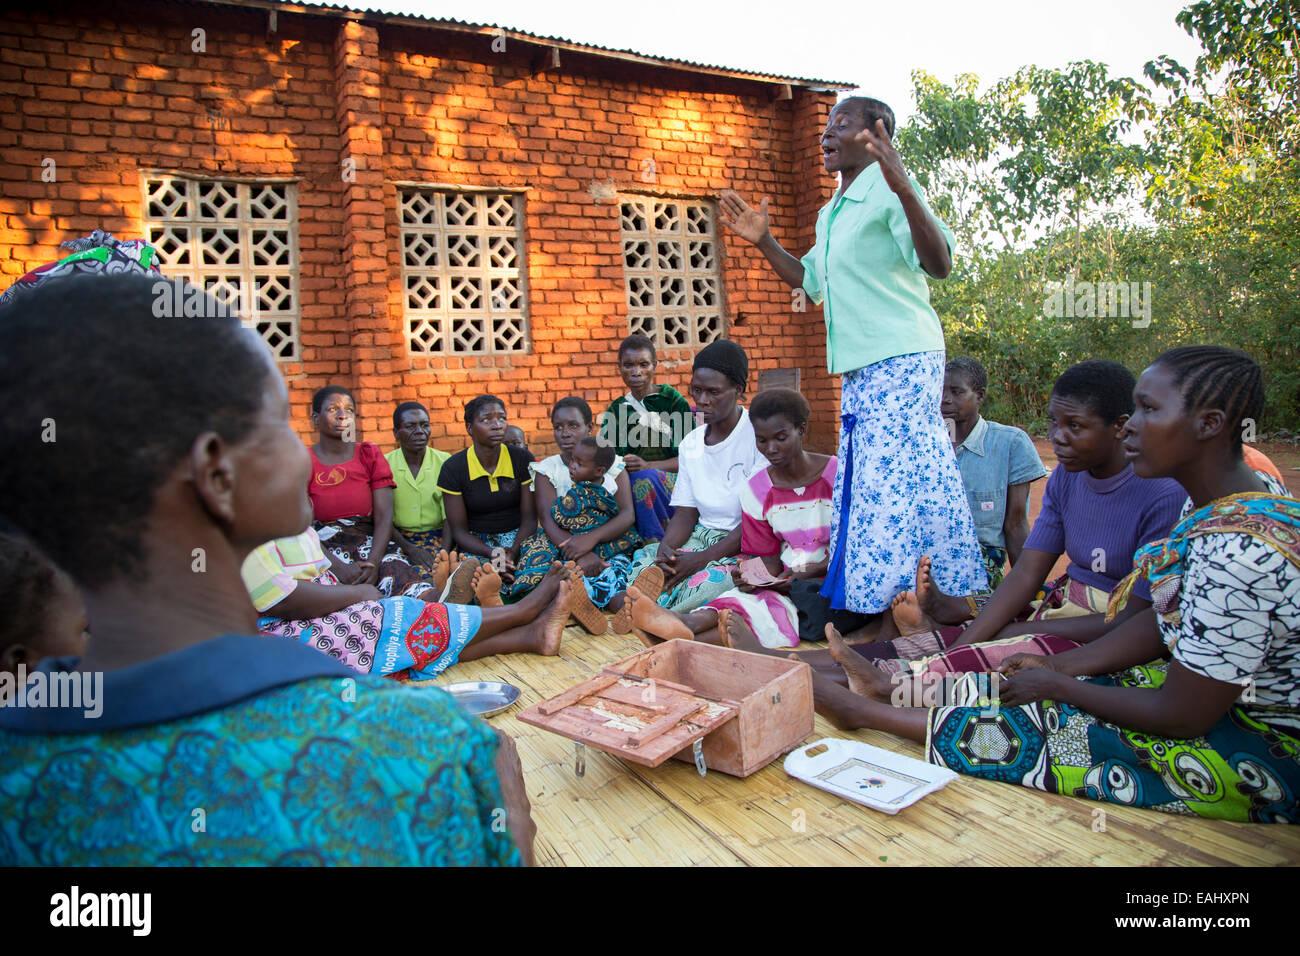 Women participate in a Village Savings and Loan meeting in Namasalima village, Mulanje District, Malawi. - Stock Image